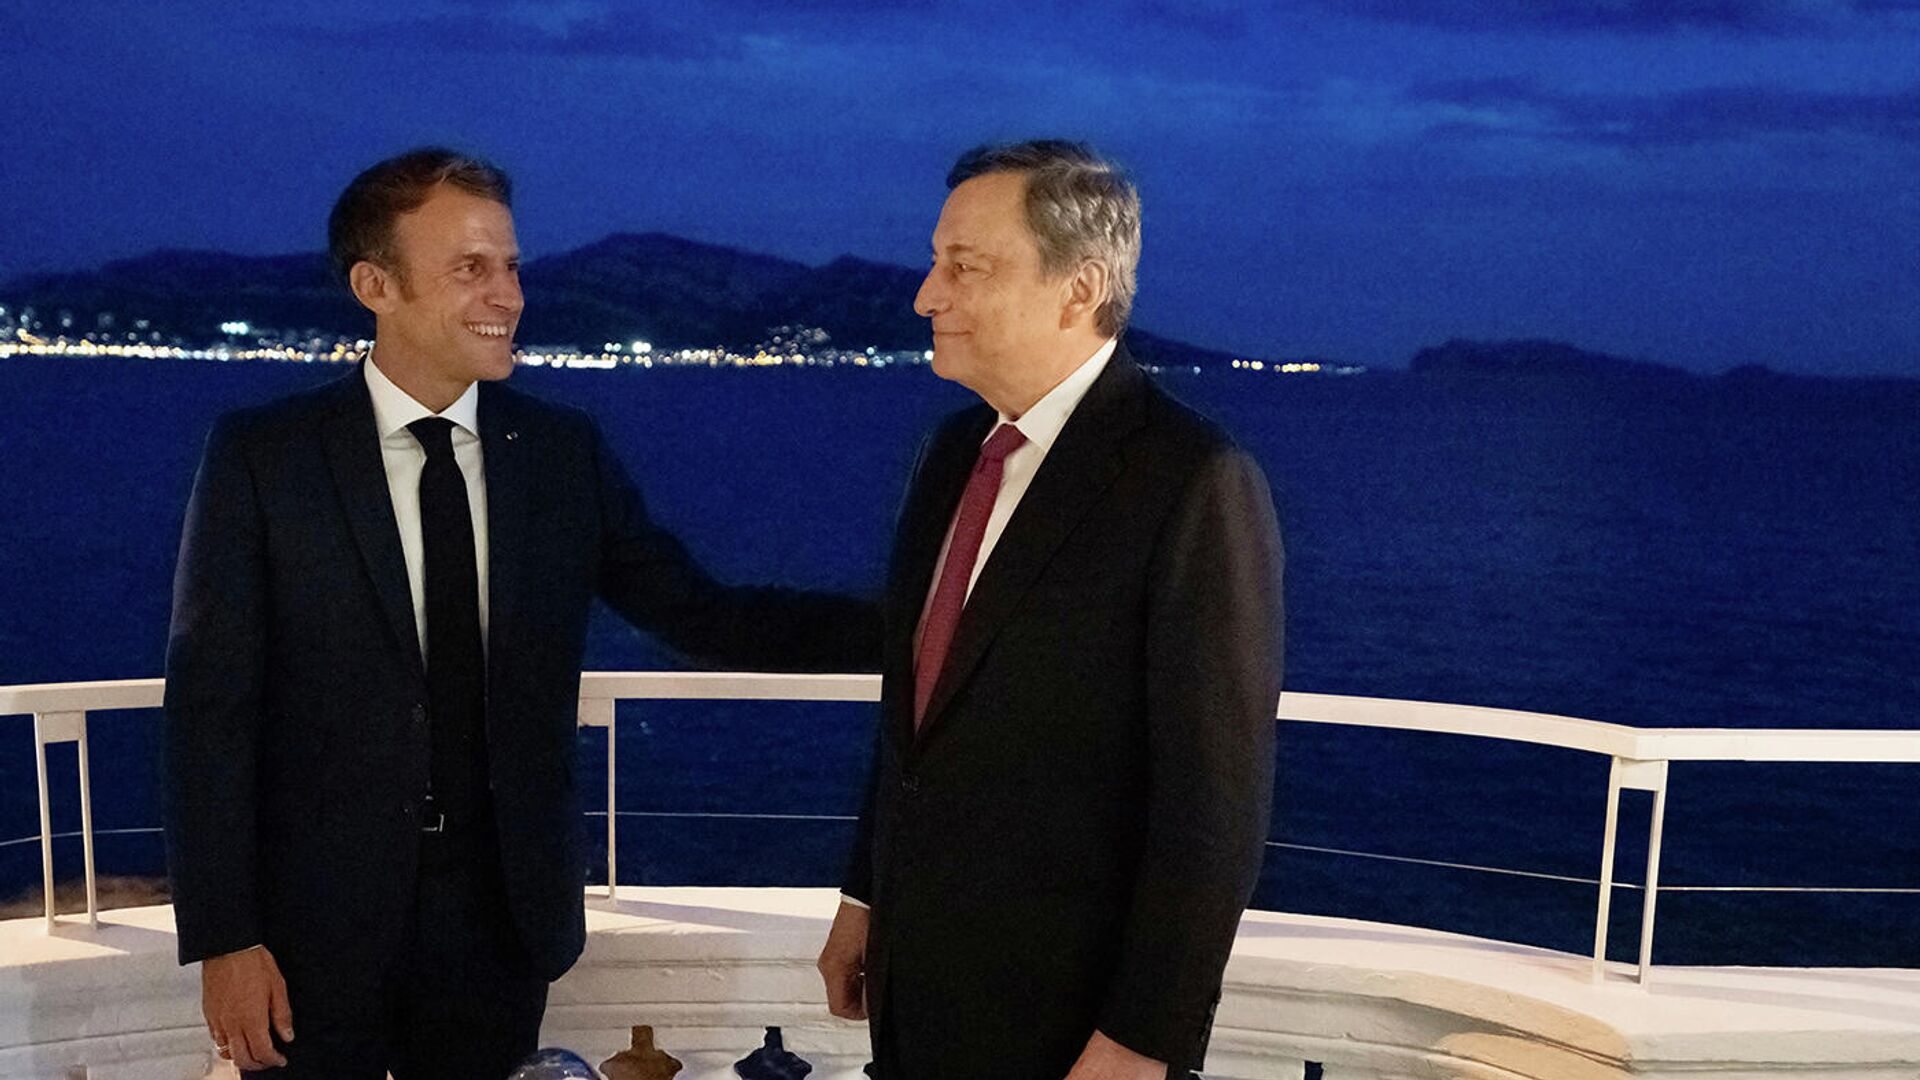 Incontro Draghi - Macron a Nizza - Sputnik Italia, 1920, 03.09.2021